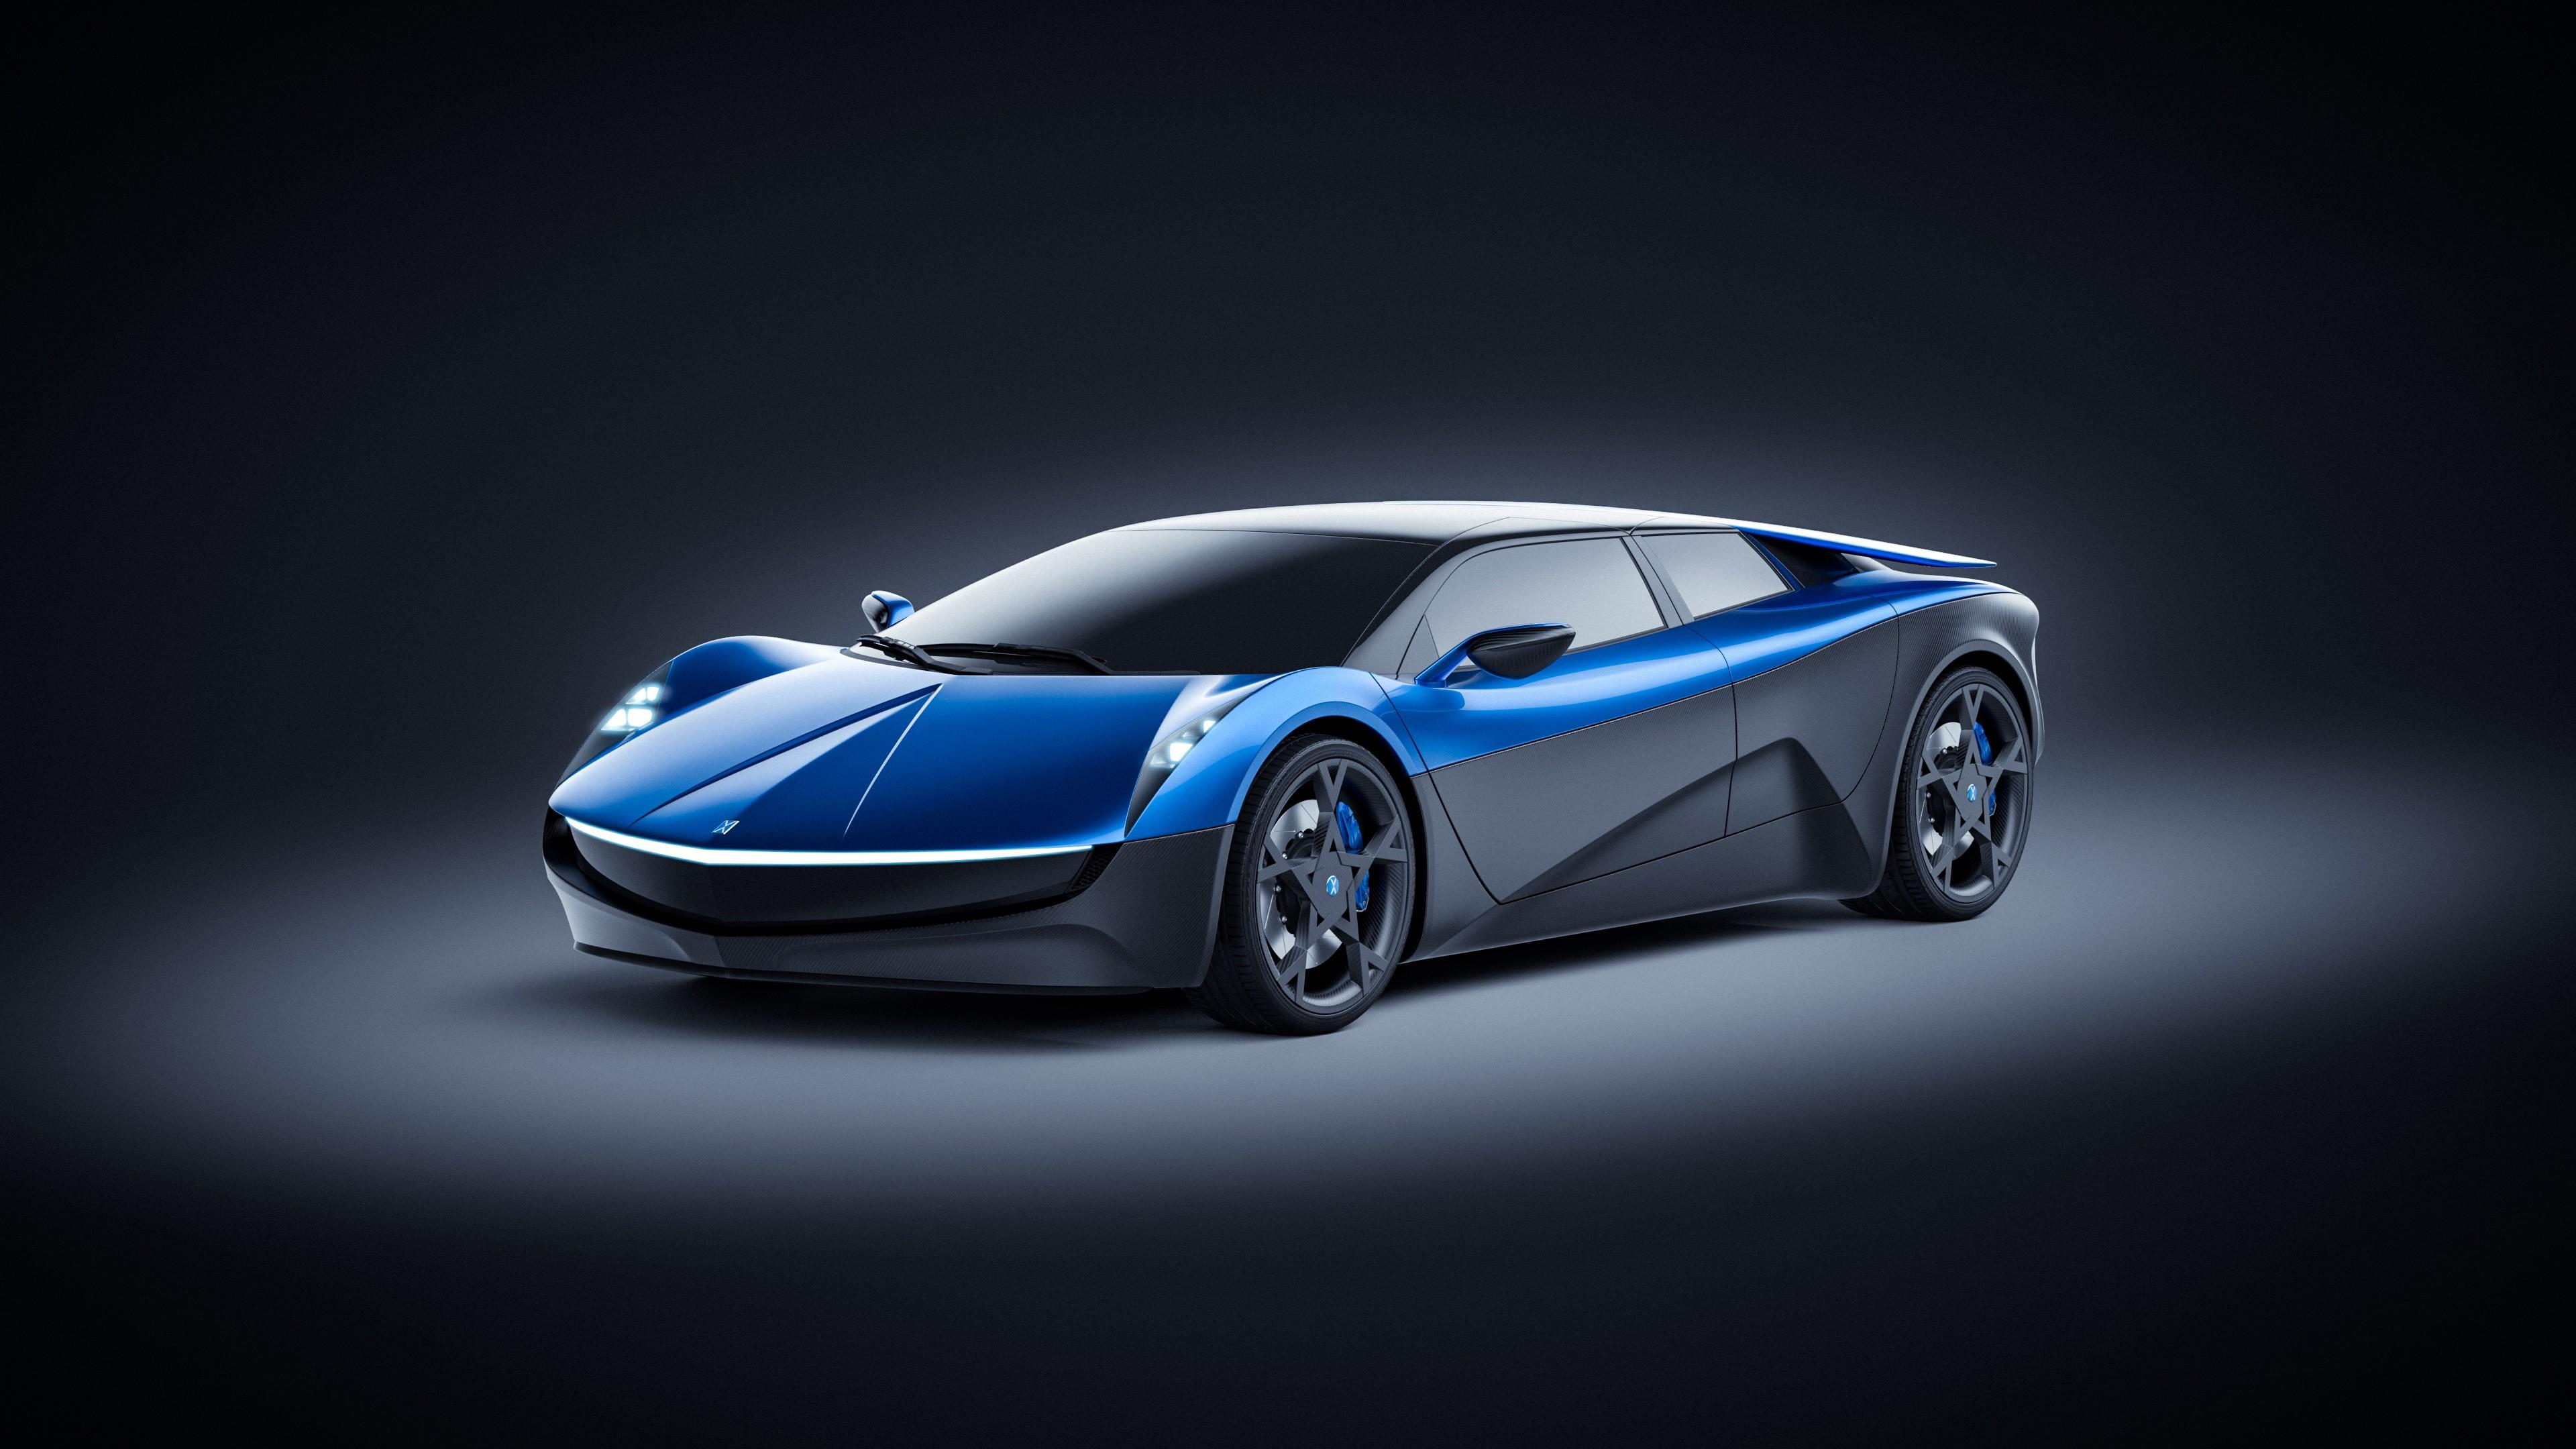 Wallpaper Elextra Electric Sedan Electric Cars Concept 4k Cars